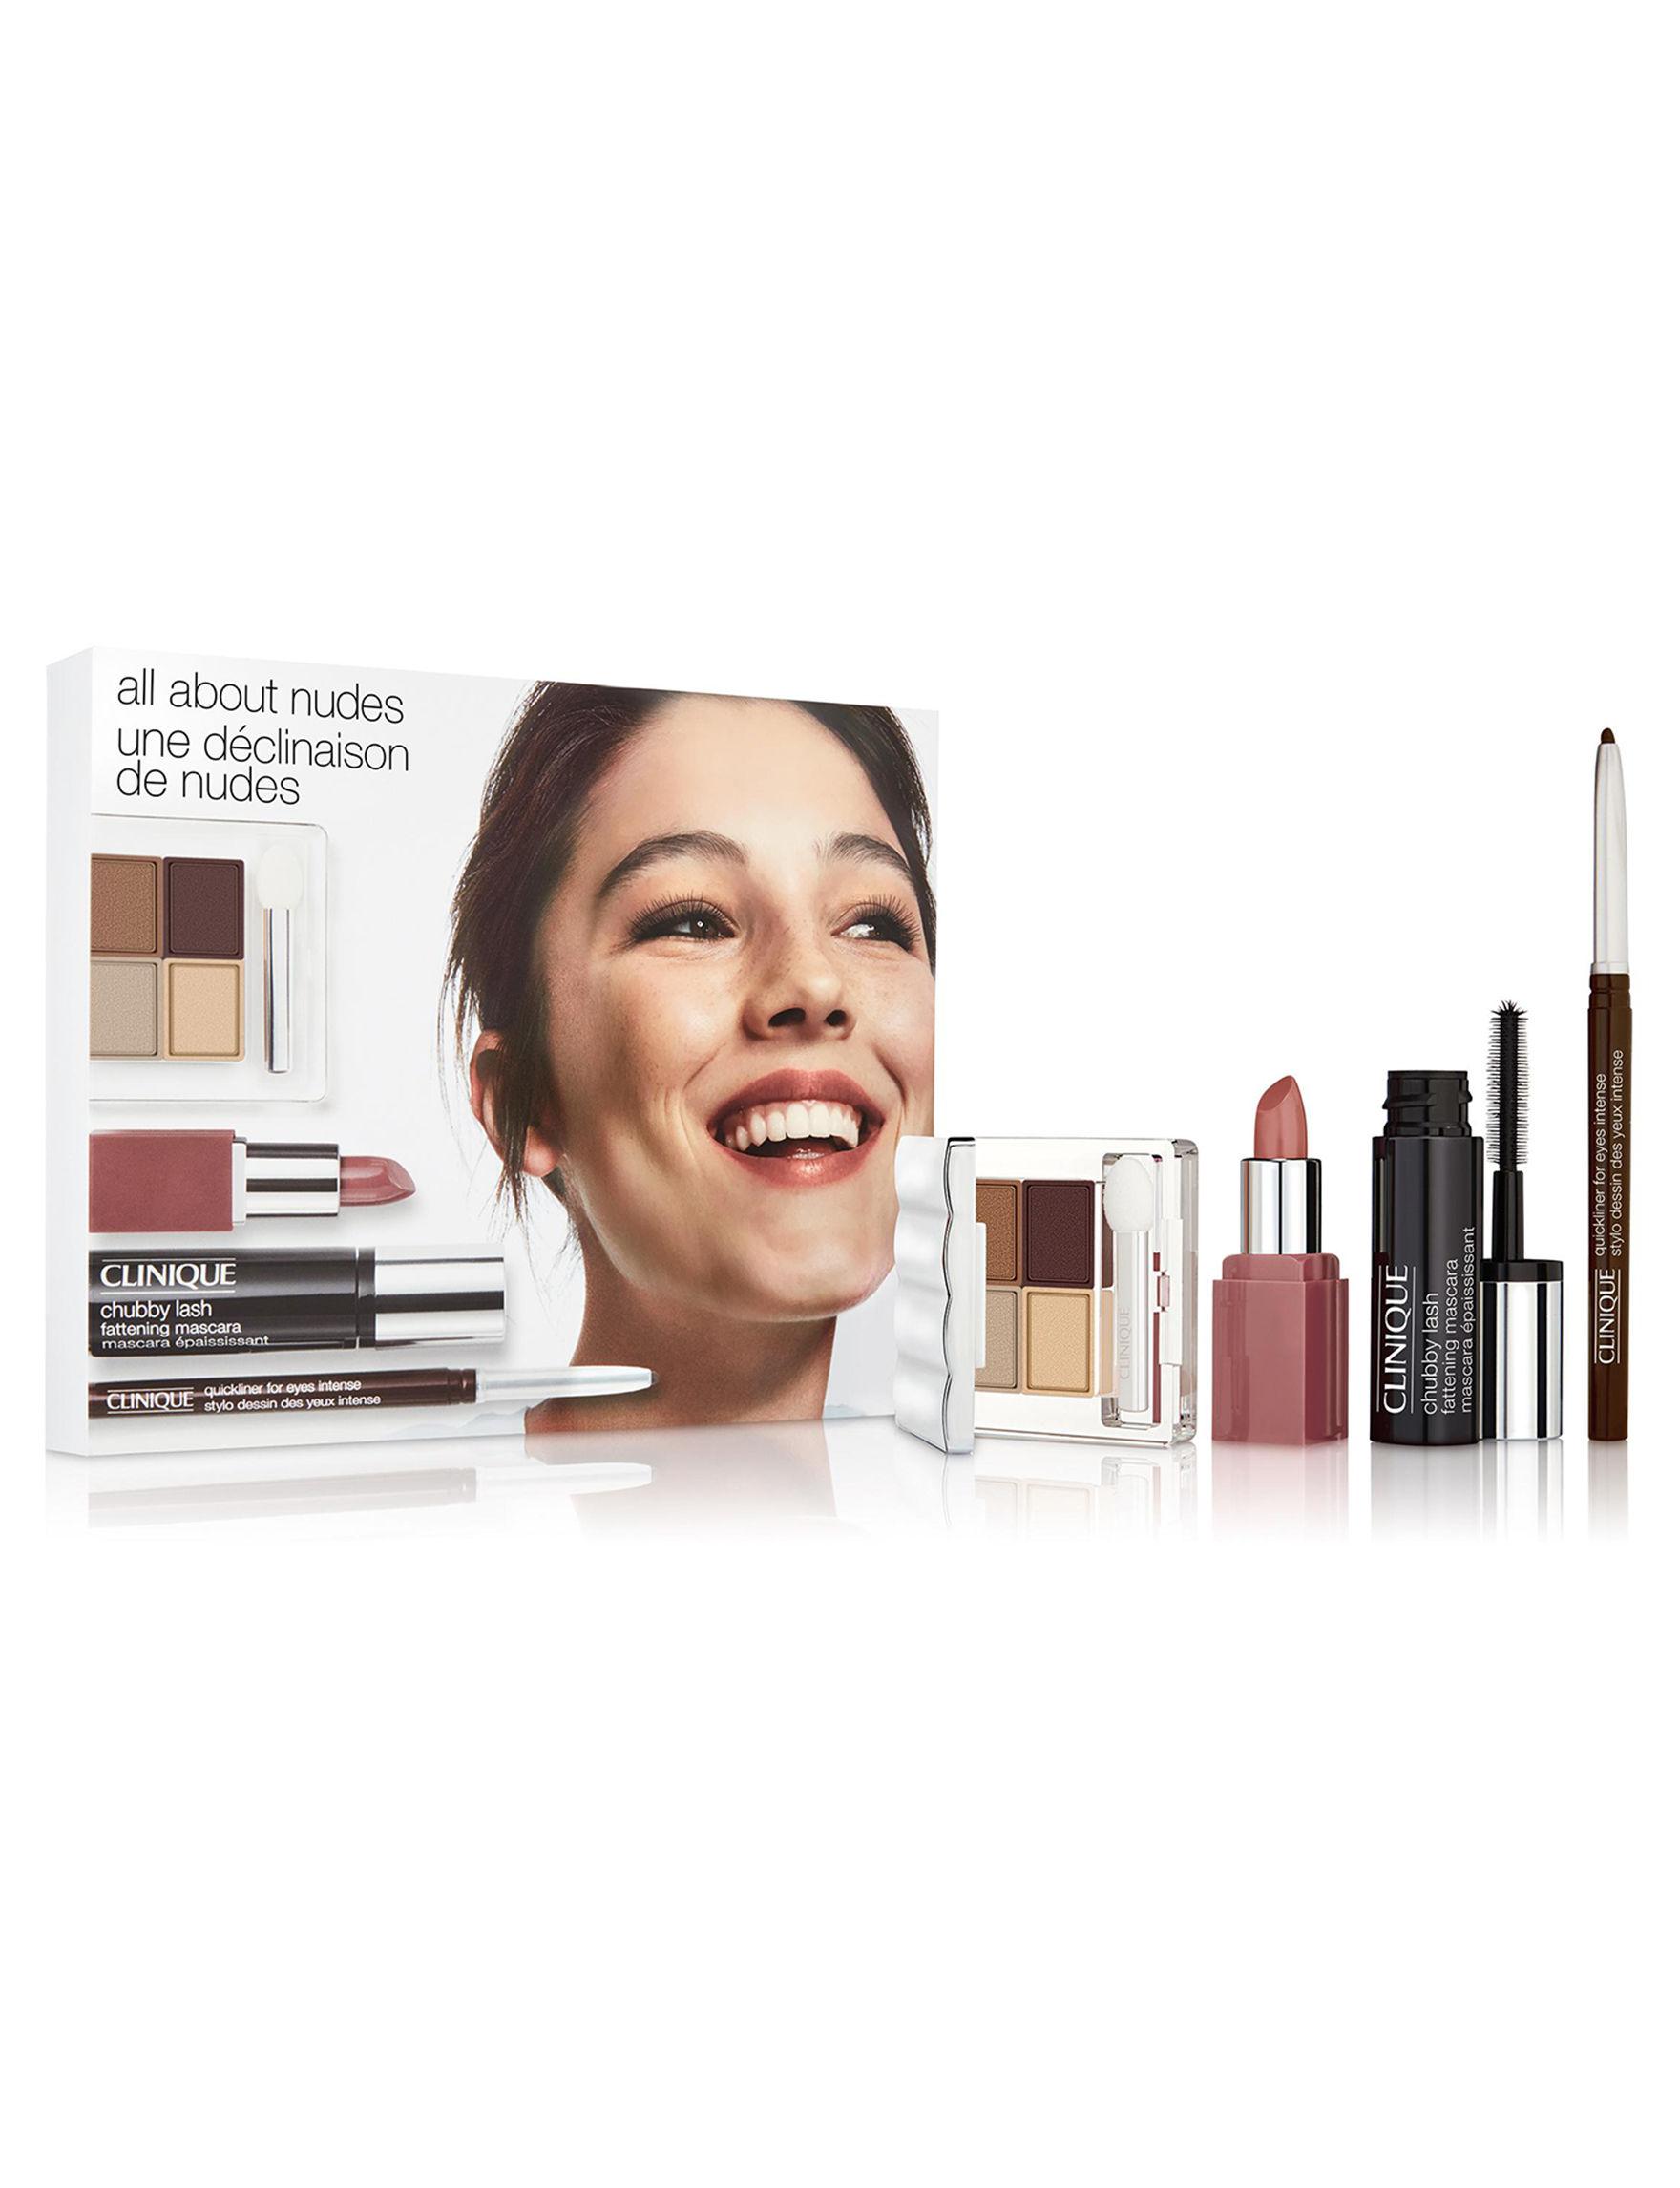 Clinique  Eyes Lips Sets & Palettes Eye Liner Eye Shadow Lipstick Mascara